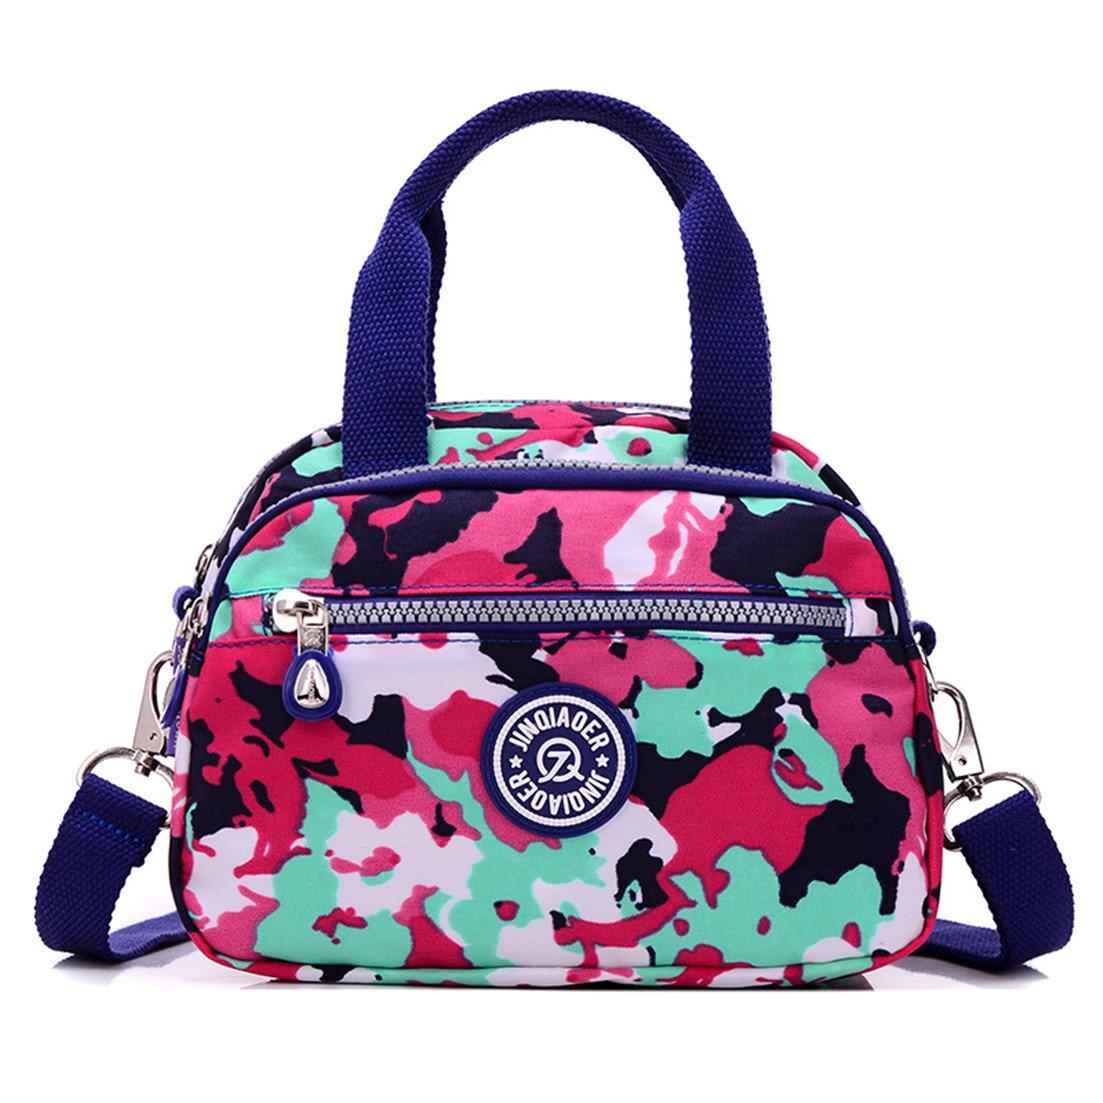 TianHengYi Girls Casual Small Nylon Cross-body Shoulder Bag Multi Pockets Lightweight Handbags & Purses 3120 Camo